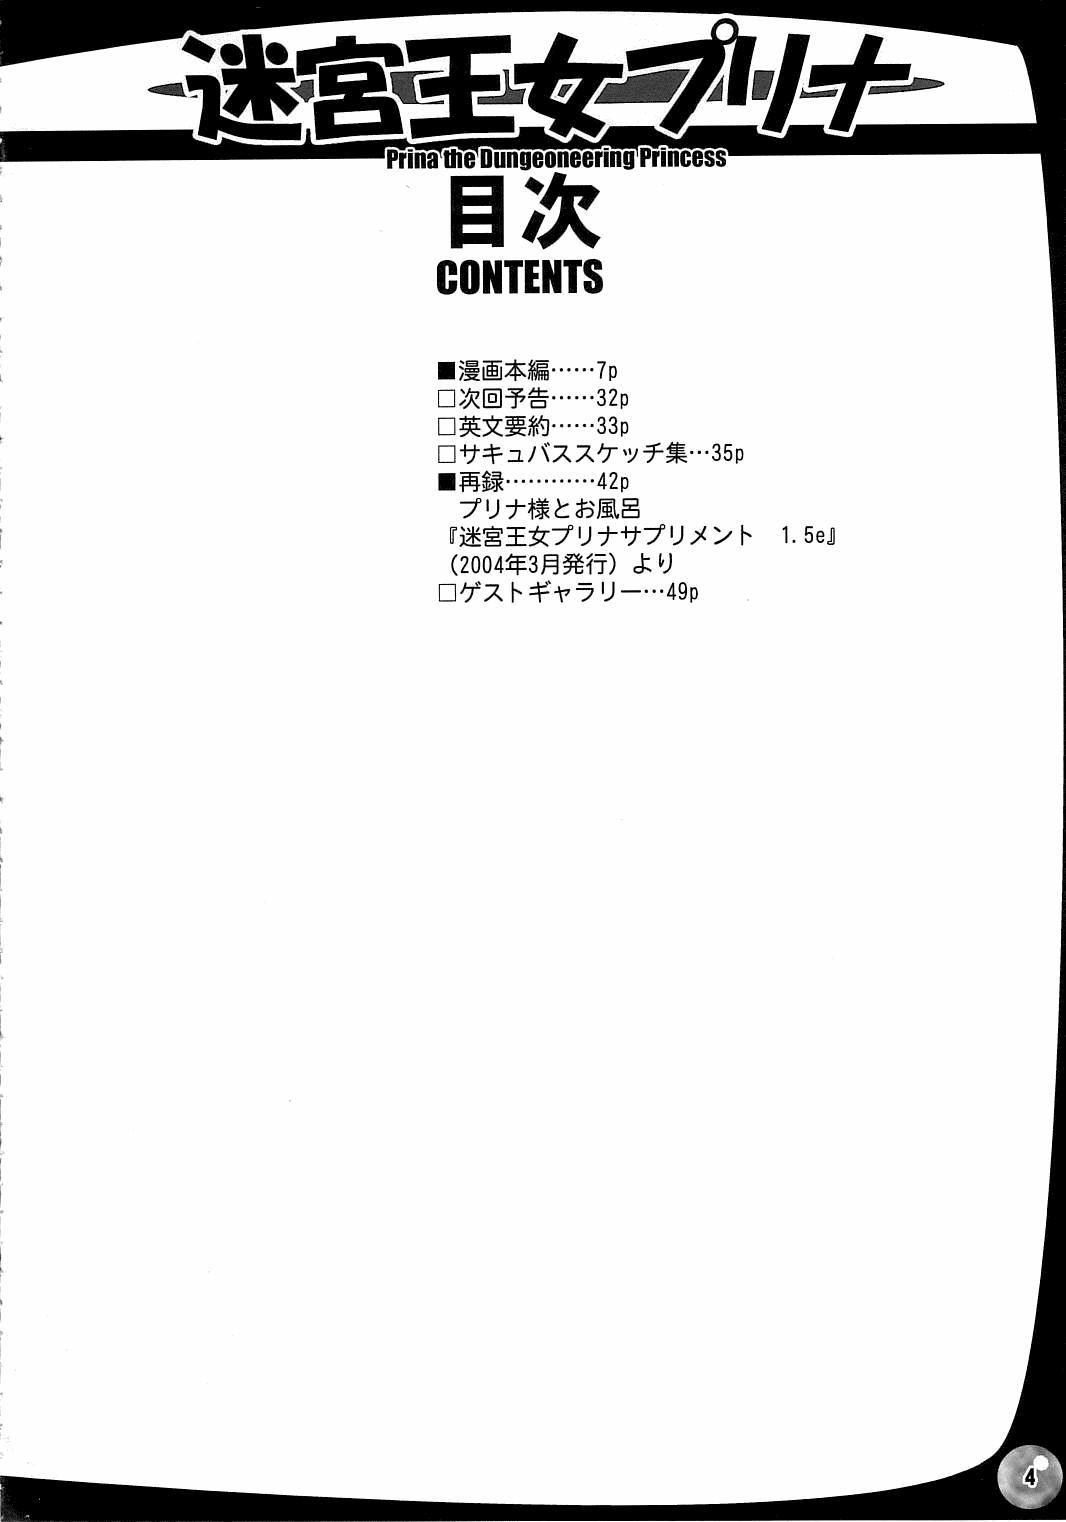 The Great Work of Alchemy Vol.15 - Meikyuu Oujo Prina 2 | Prina the Dungeoneering Princess 2 3